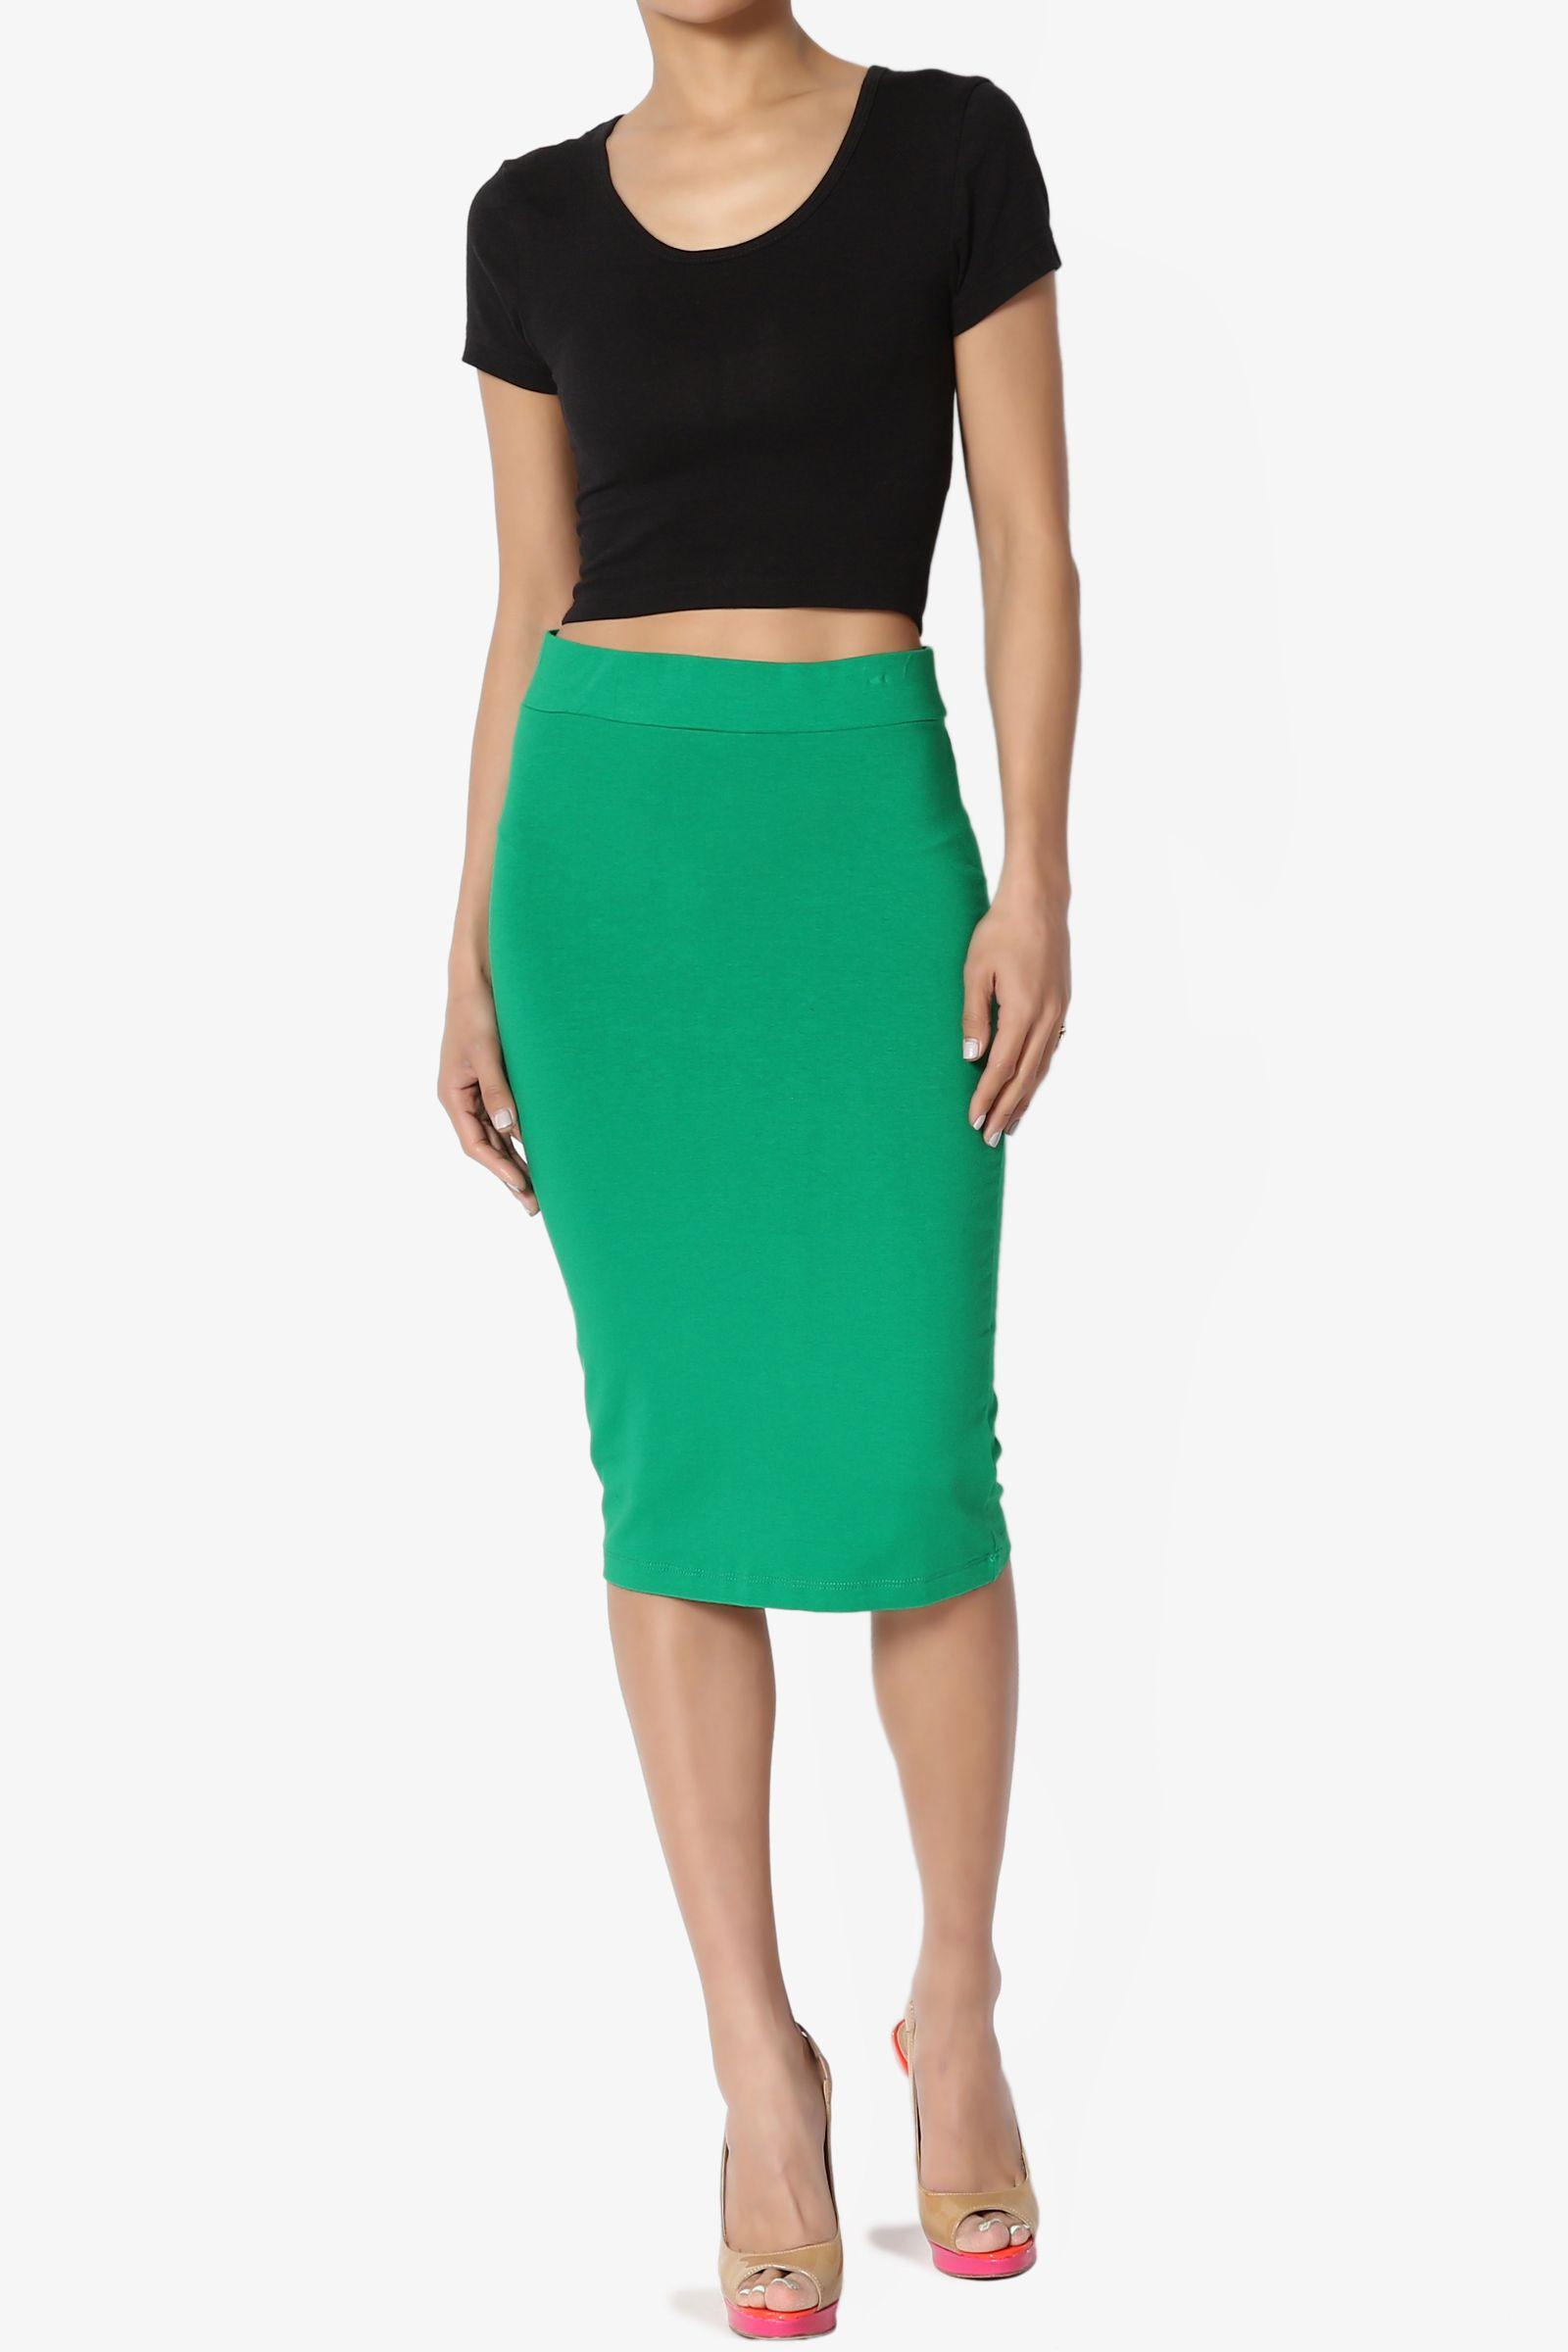 03bf77a3c TheMogan Women's S~3X Elastic High Waist Stretch Cotton Knee Pencil Midi  Skirt#High, #Waist, #Elastic